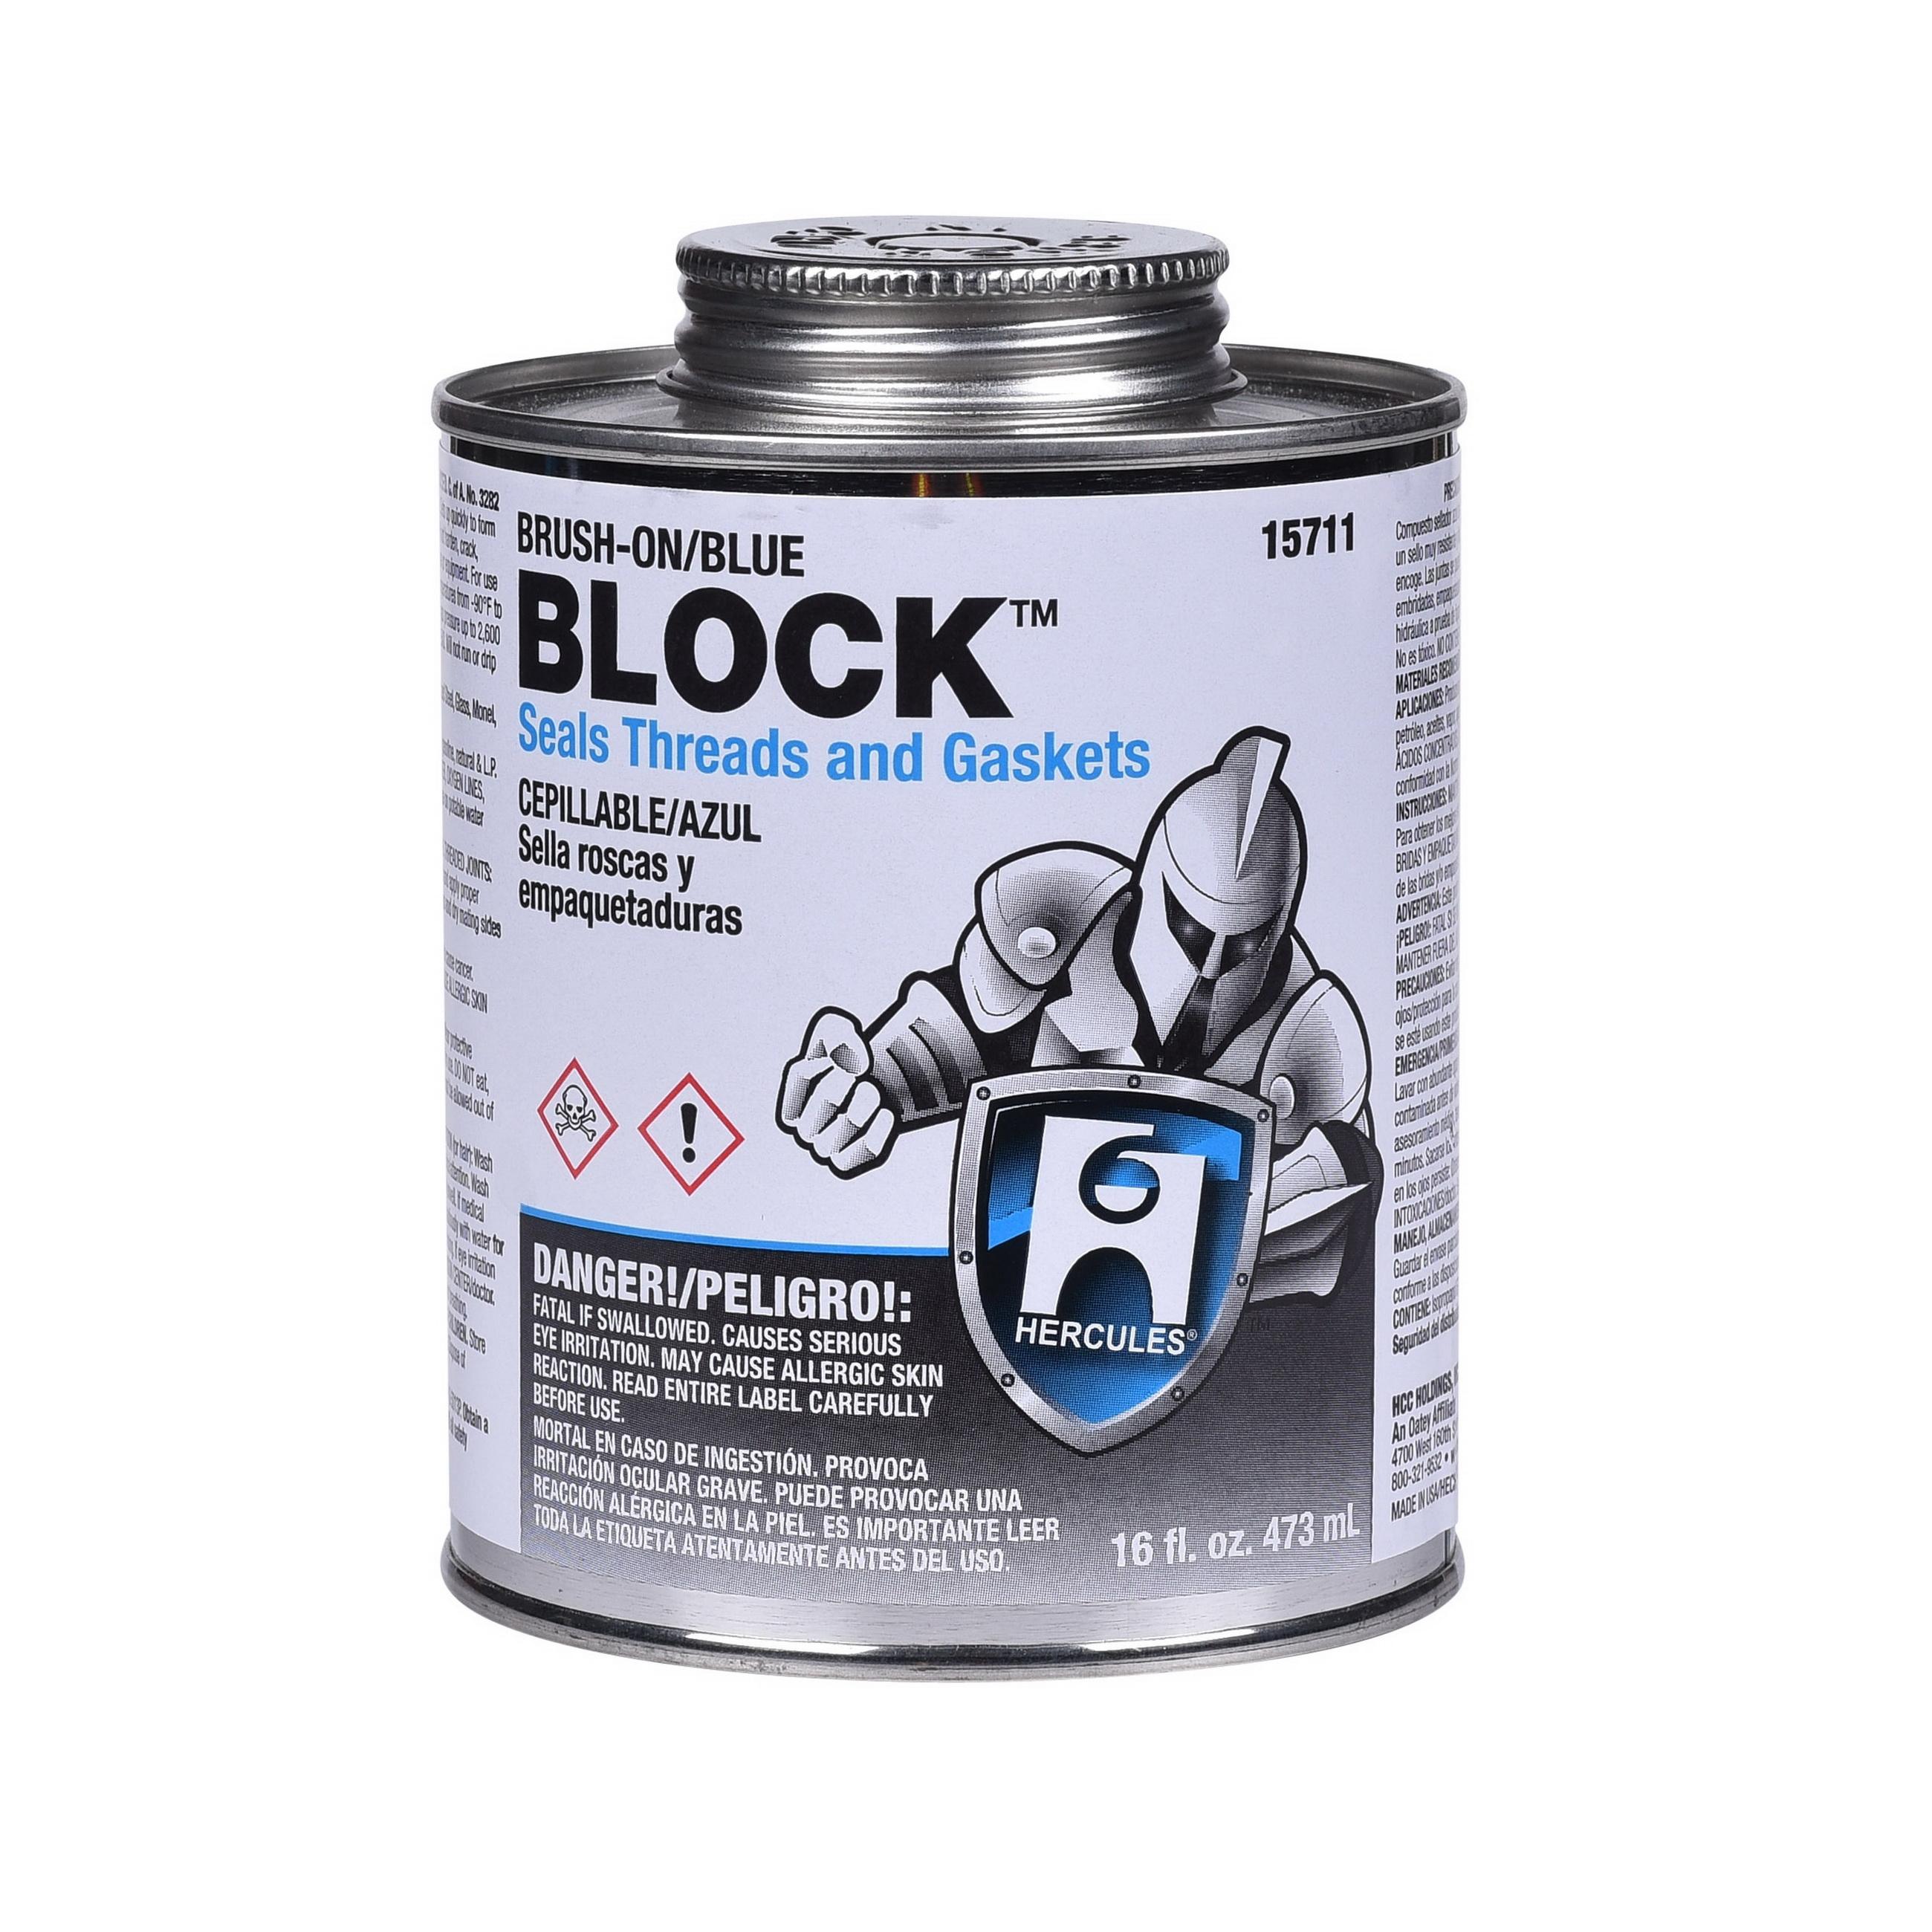 Hercules® BLOCK™ 15711 All Purpose Pipe Thread Sealant, 1 pt Can, Blue